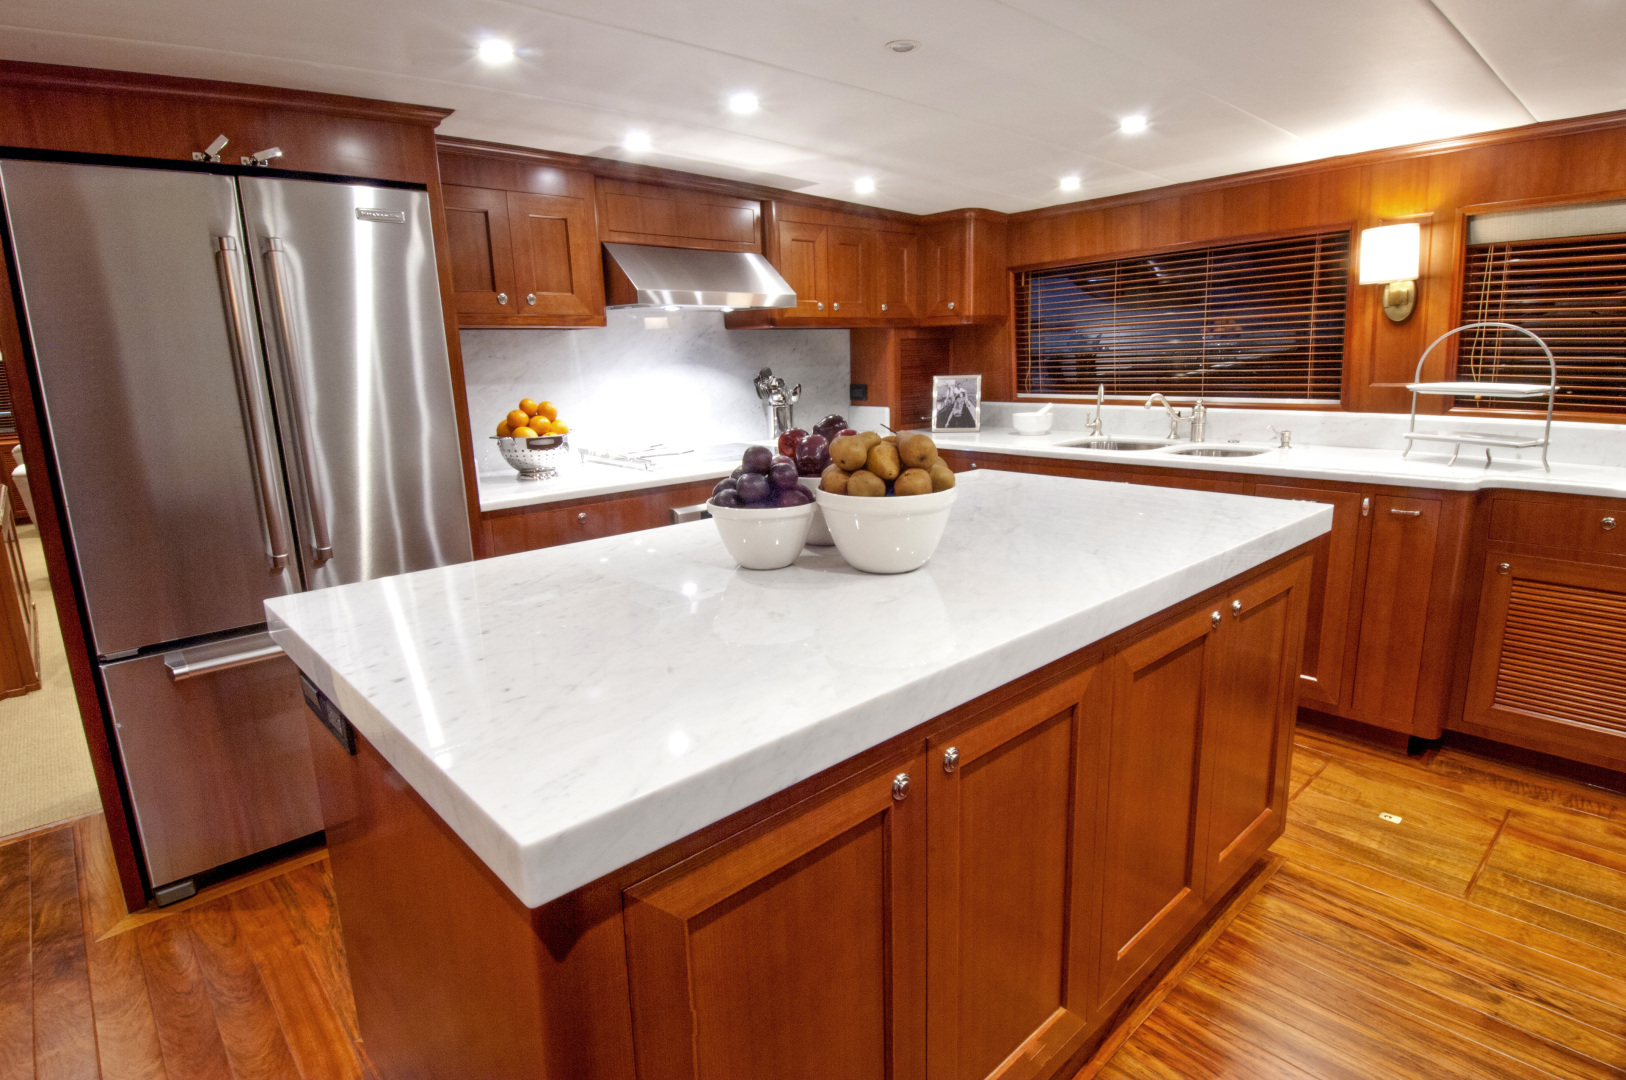 Offshore Yachts-Motoryacht 2020 -United States-1117783   Thumbnail